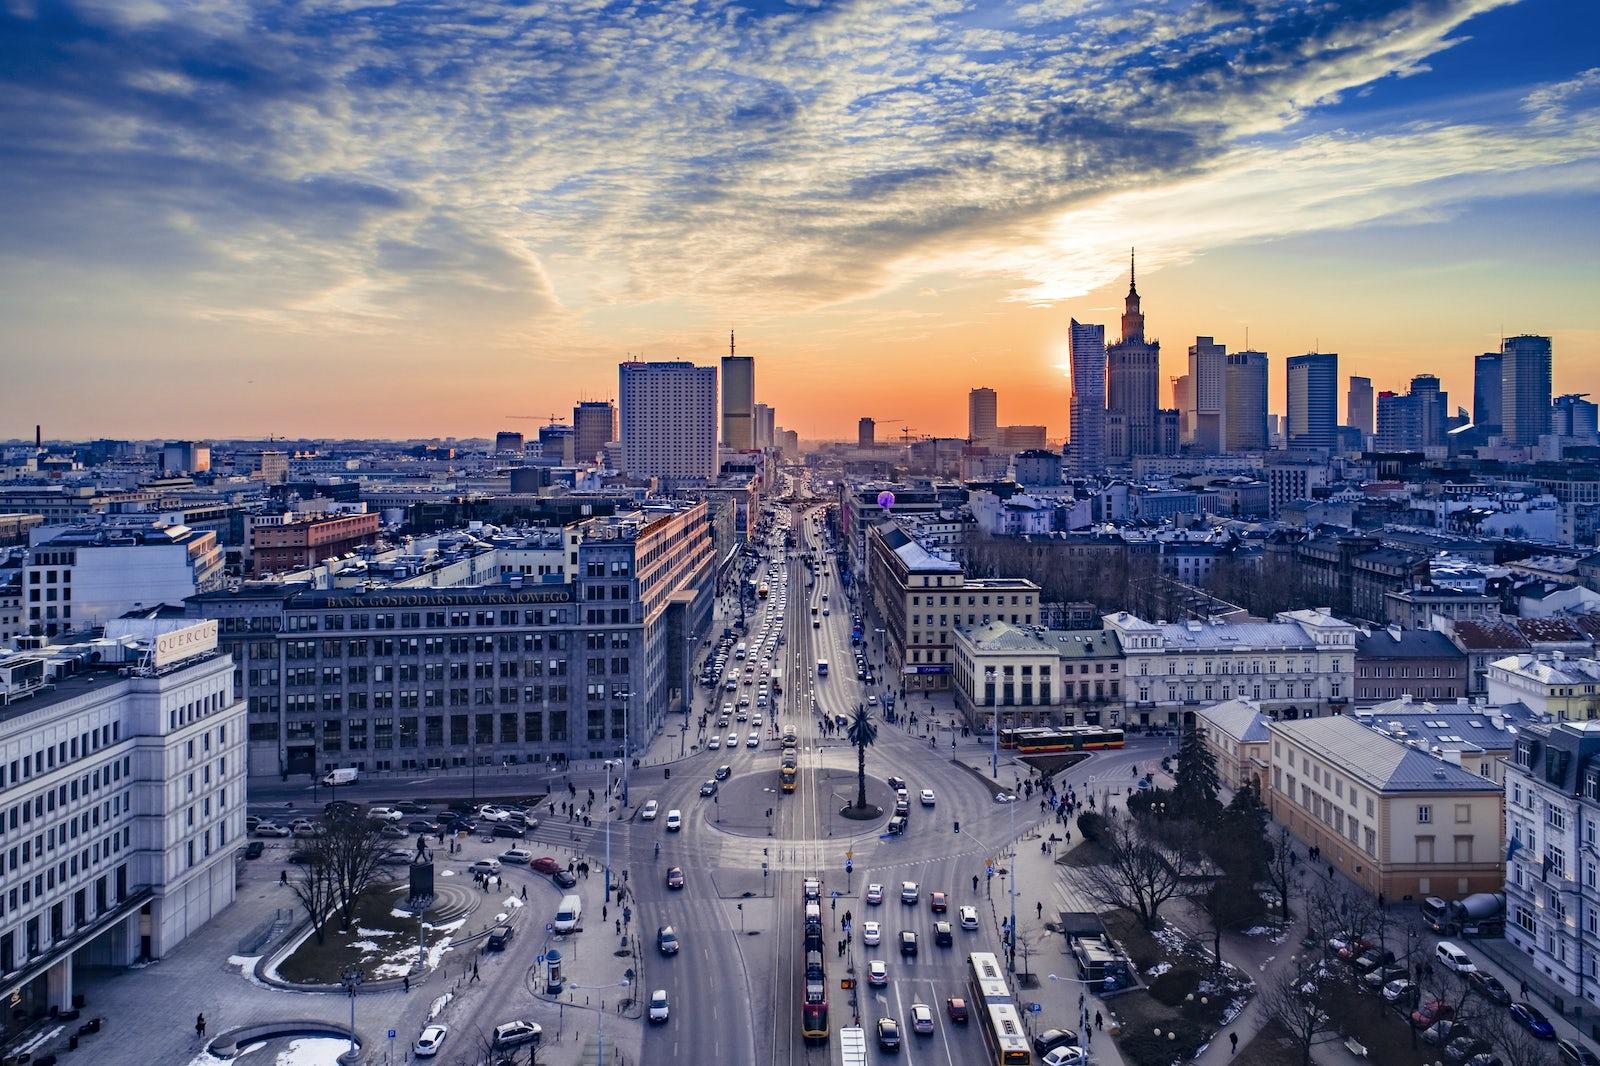 © iStock/Drone in Warsaw by Prokreacja.com